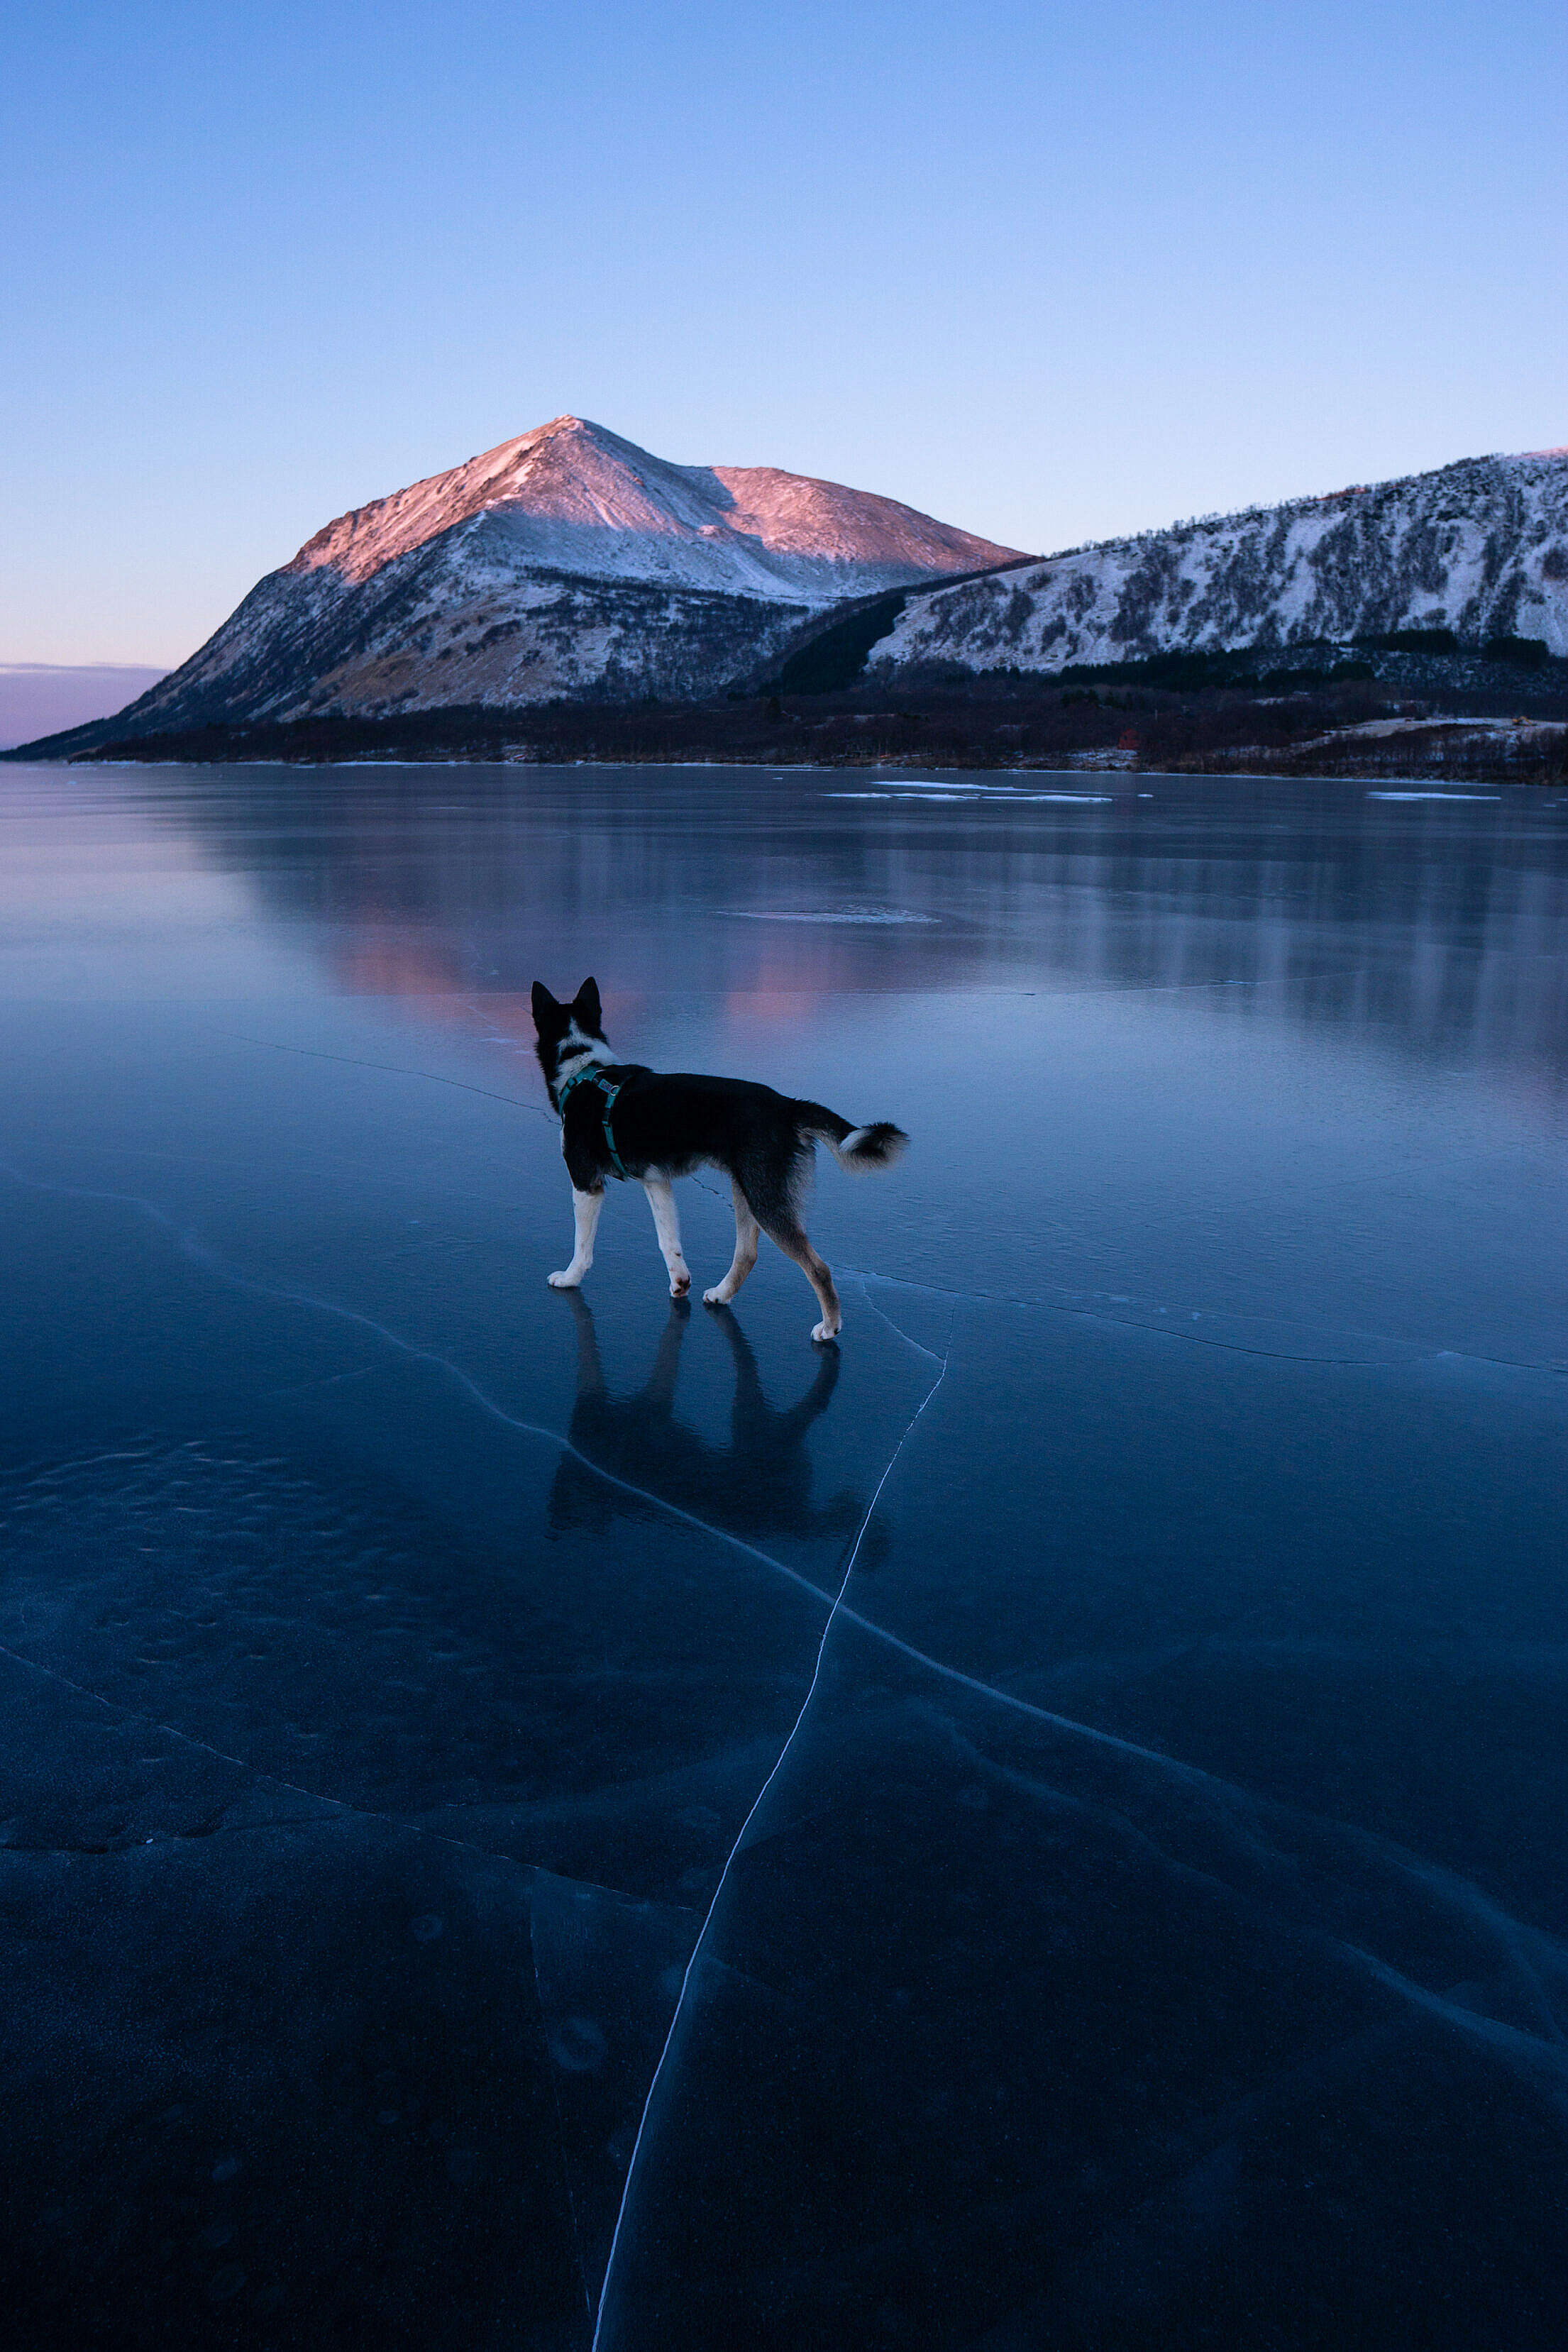 Husky Dog on a Frozen Lake Free Stock Photo